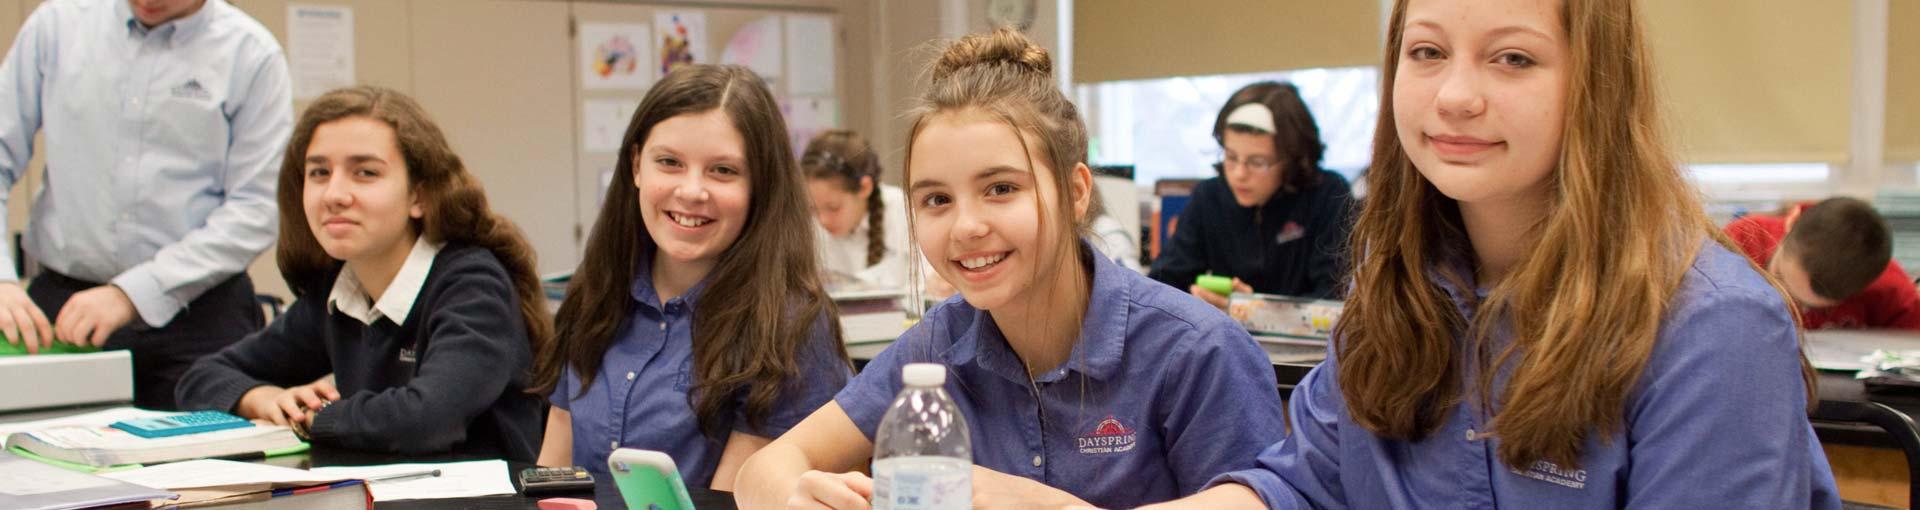 Dayspring Christian Academy Students